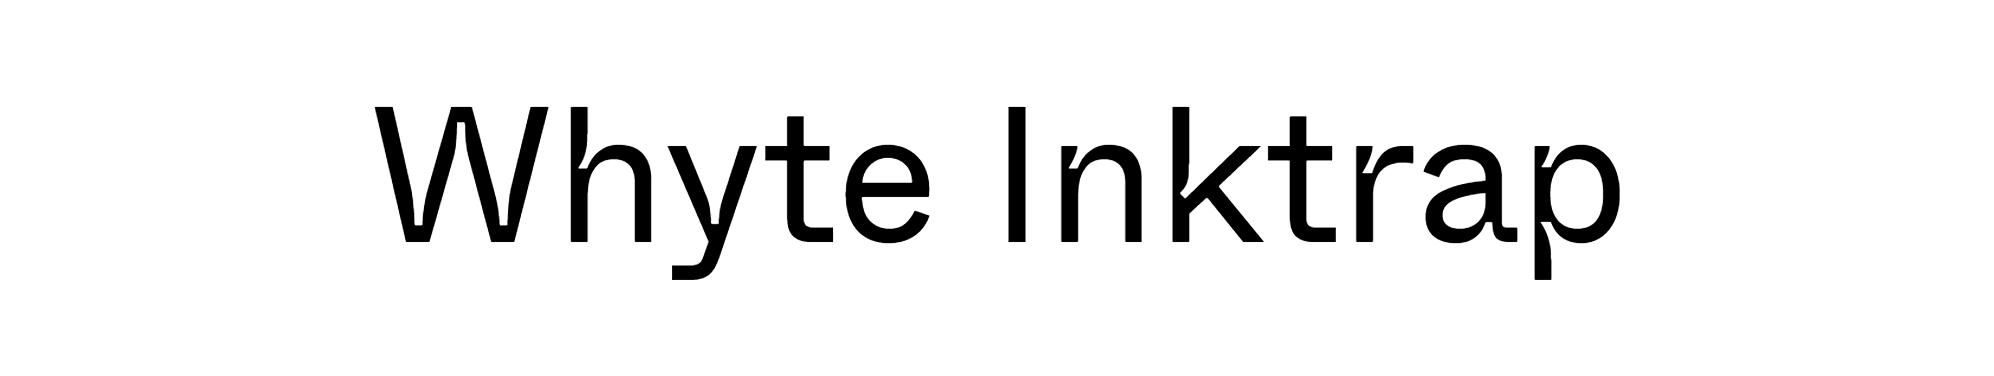 Whyte Inktrap